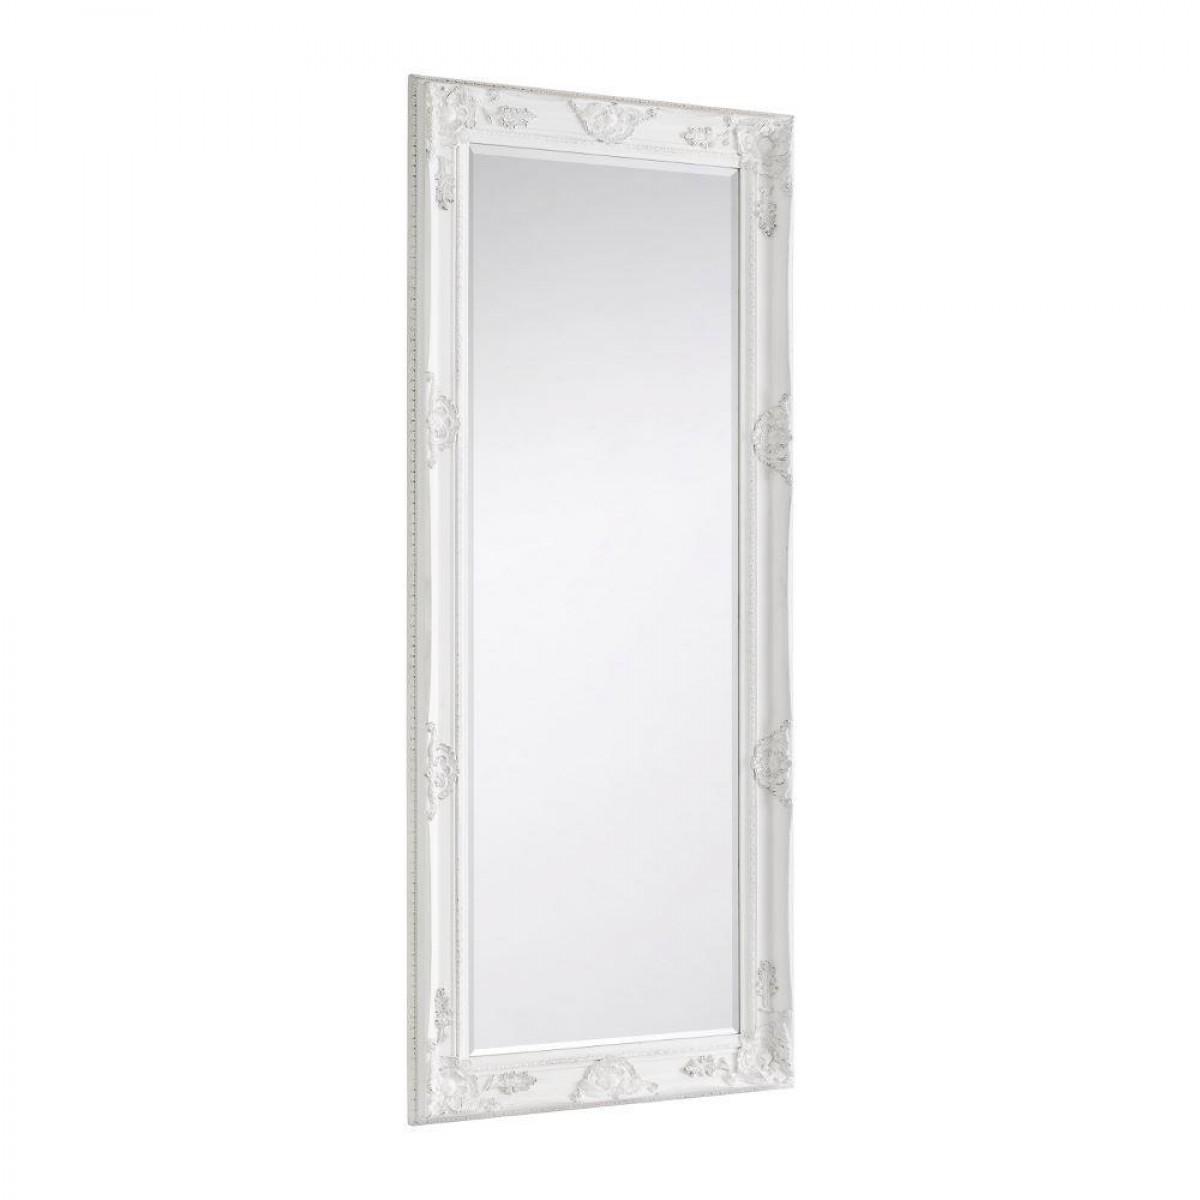 Palais White Lean-to Dress Mirror - 70 cm x 170 cm